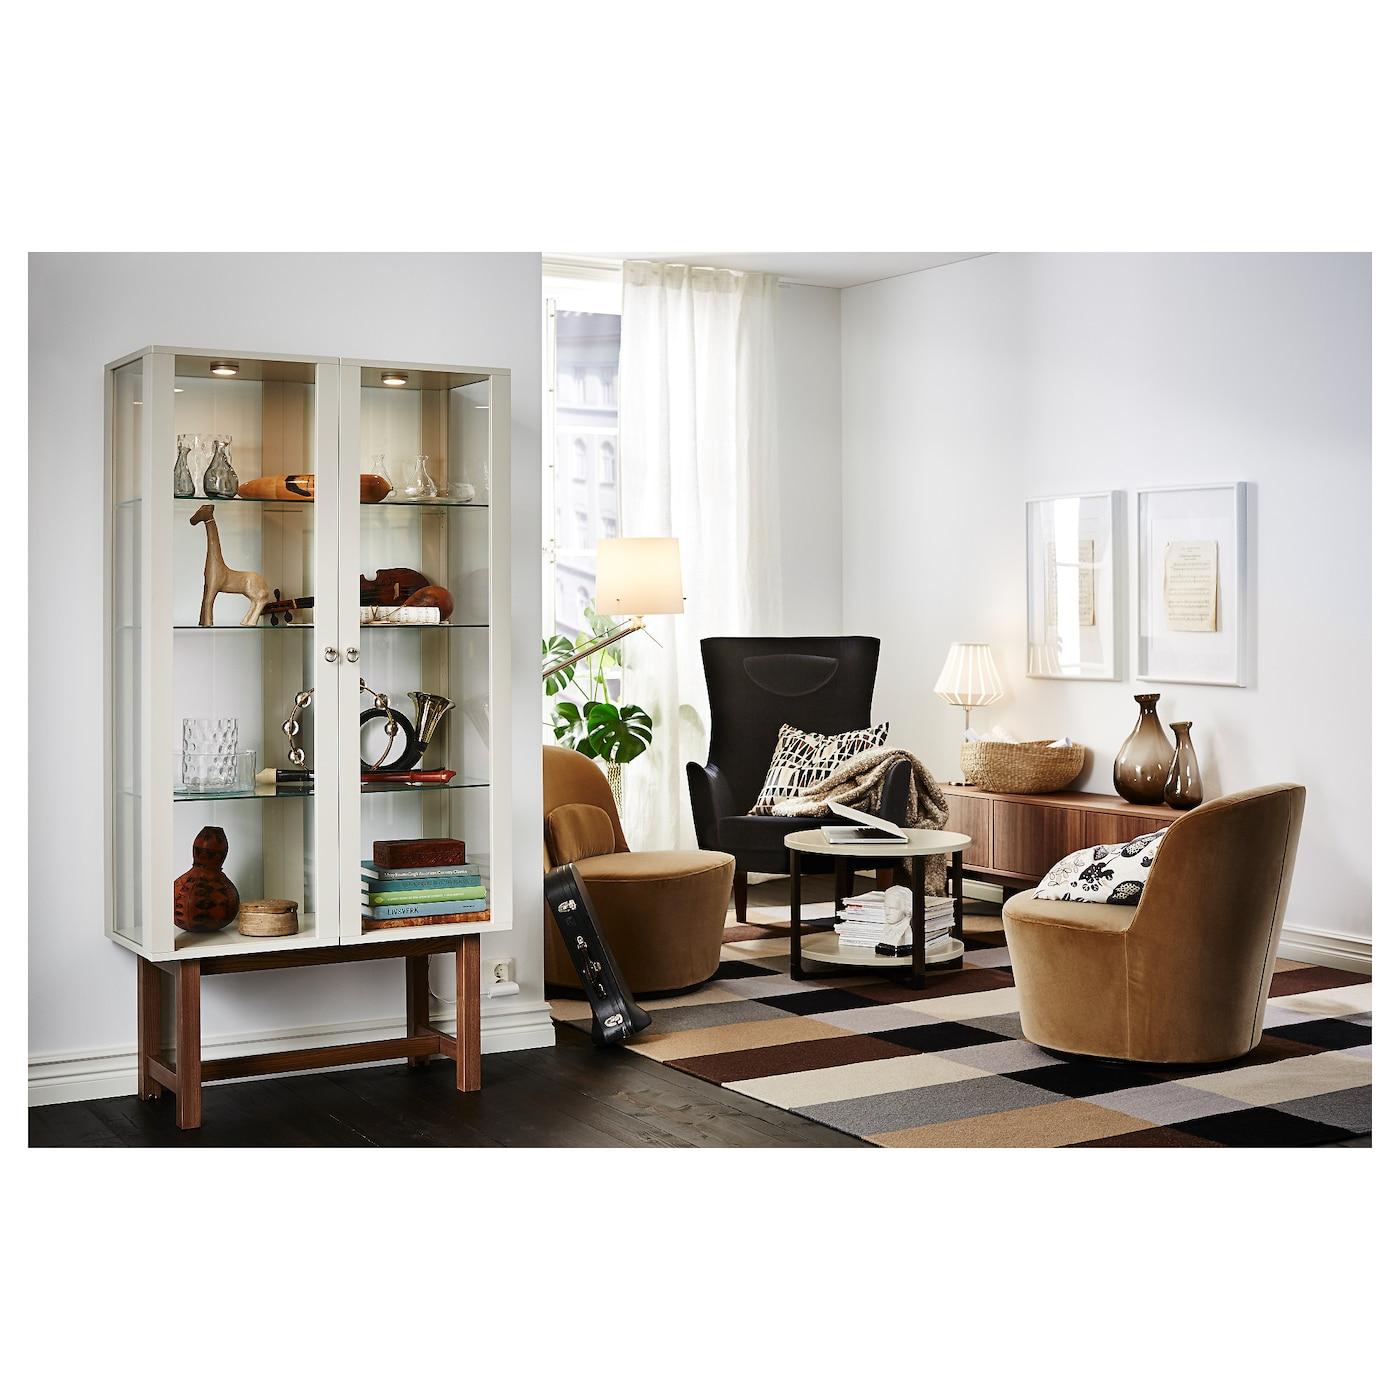 stockholm rug flatwoven handmade chequered brown 250 x 350 cm ikea. Black Bedroom Furniture Sets. Home Design Ideas